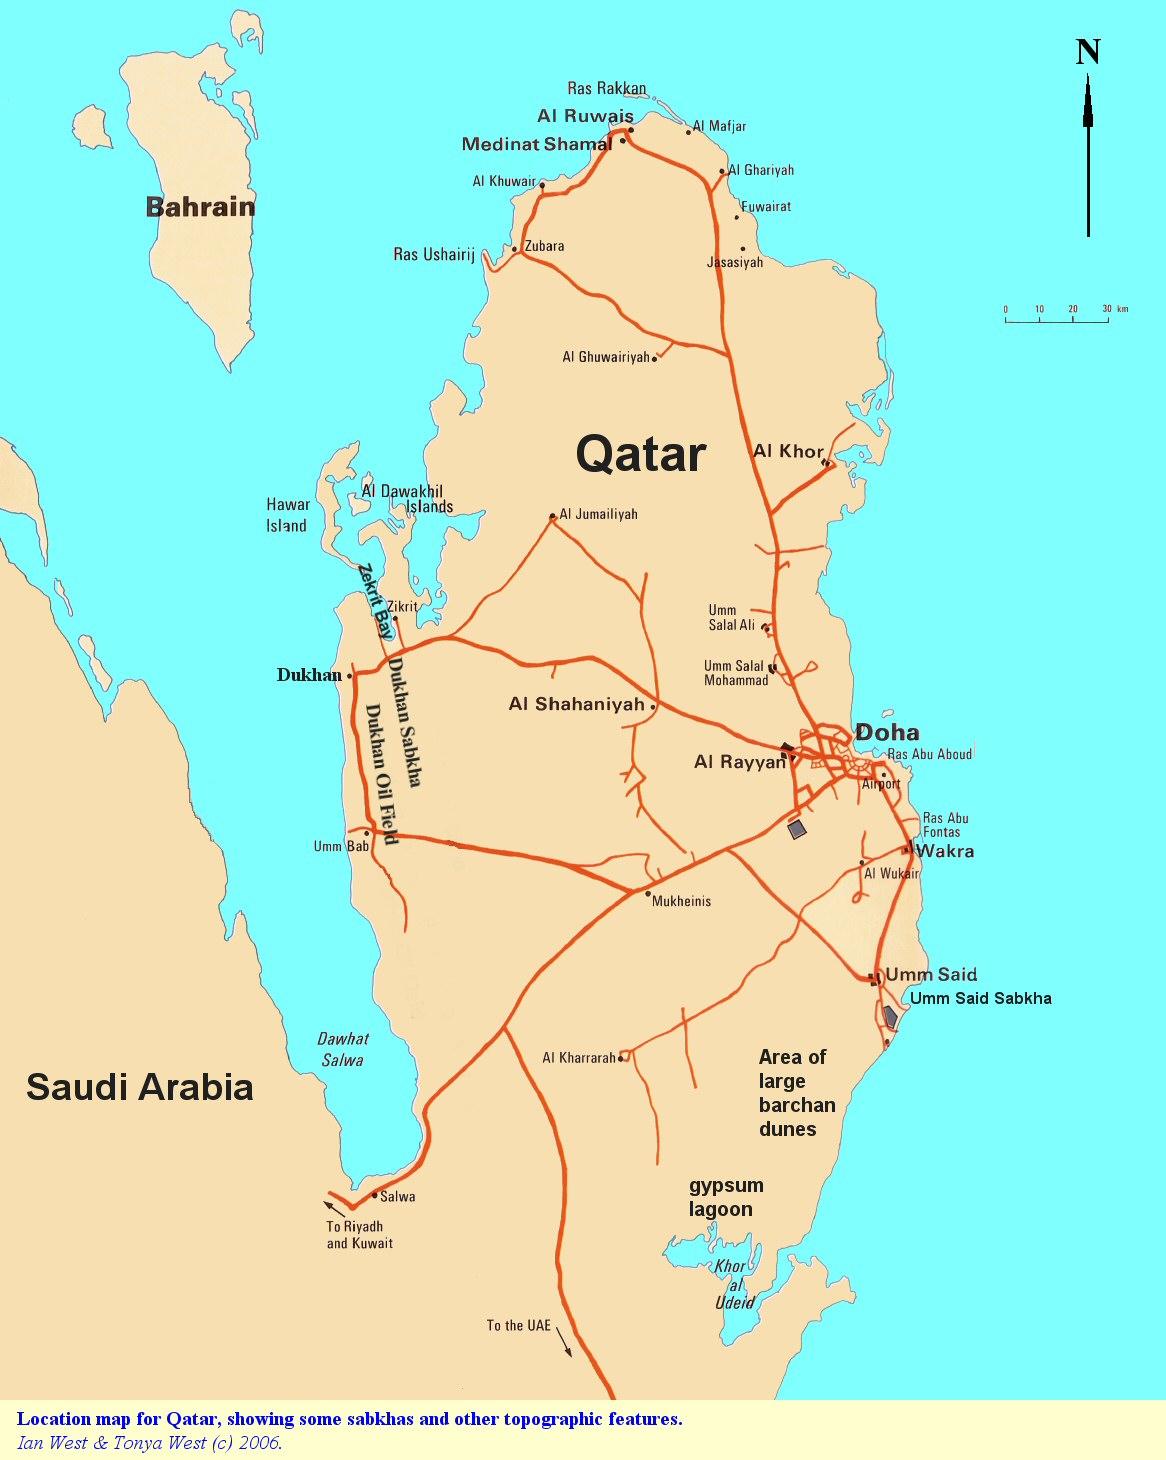 map of dubai and surrounding area with Ewraqphoto Qatar Regional Map on San Diego Beach Map besides Index furthermore Italy Greece Map further Maps also World Map Dubai W 7Cr ijsRMxOb 7CfUm2 AHrxheYmI1dhka sBdm7wescg.